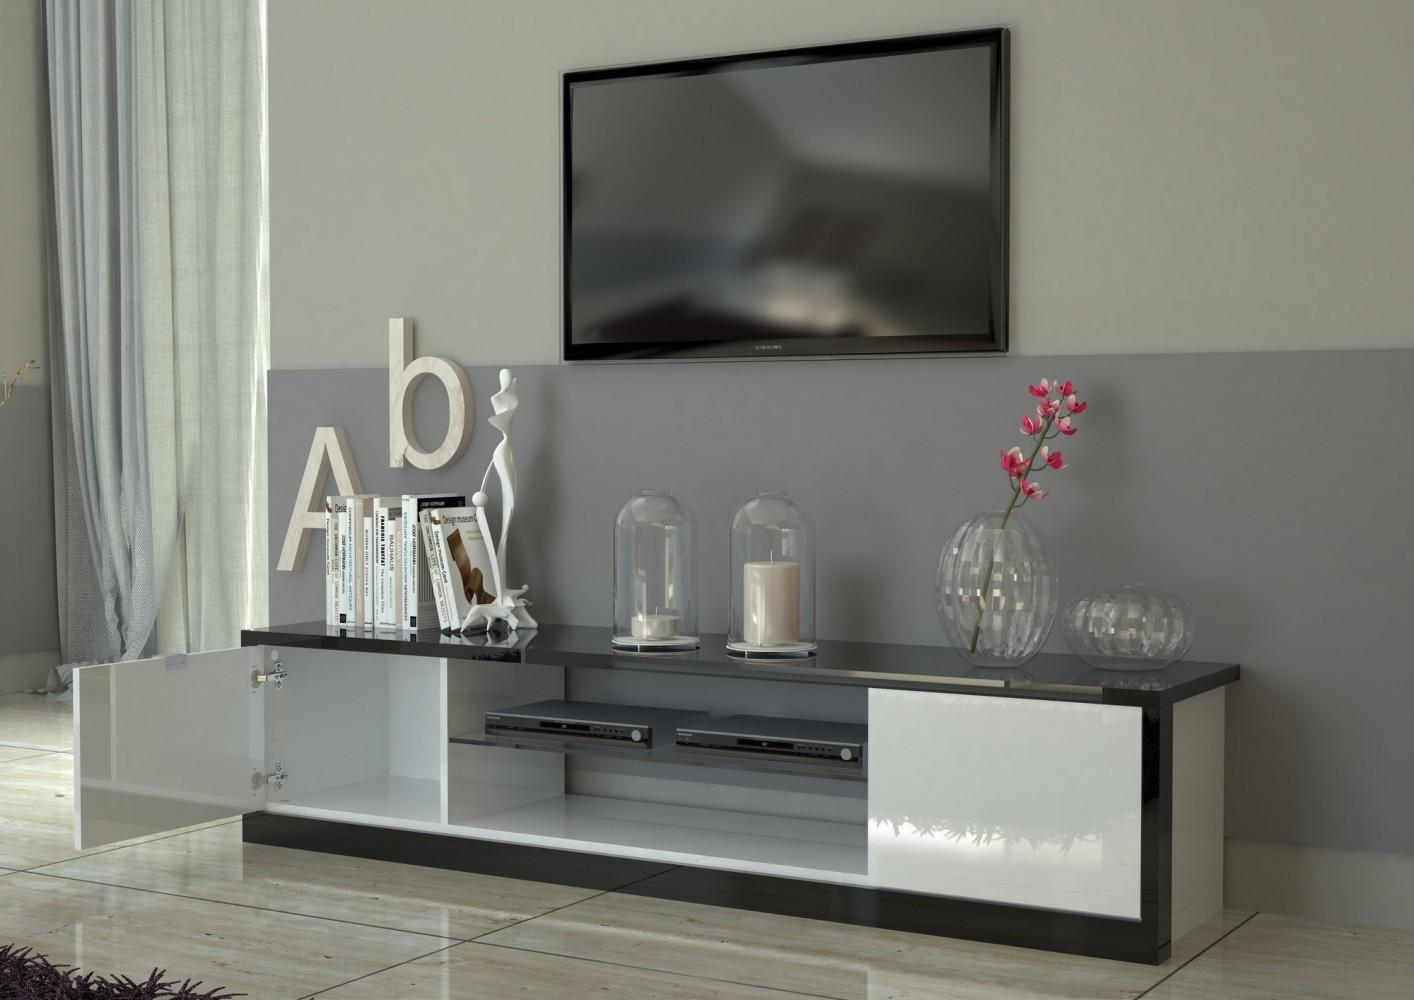 Wohnwand design modern  Tecnos MITO Lowboard, 180cm Wohnwand Mediawand Italian Design modern ...